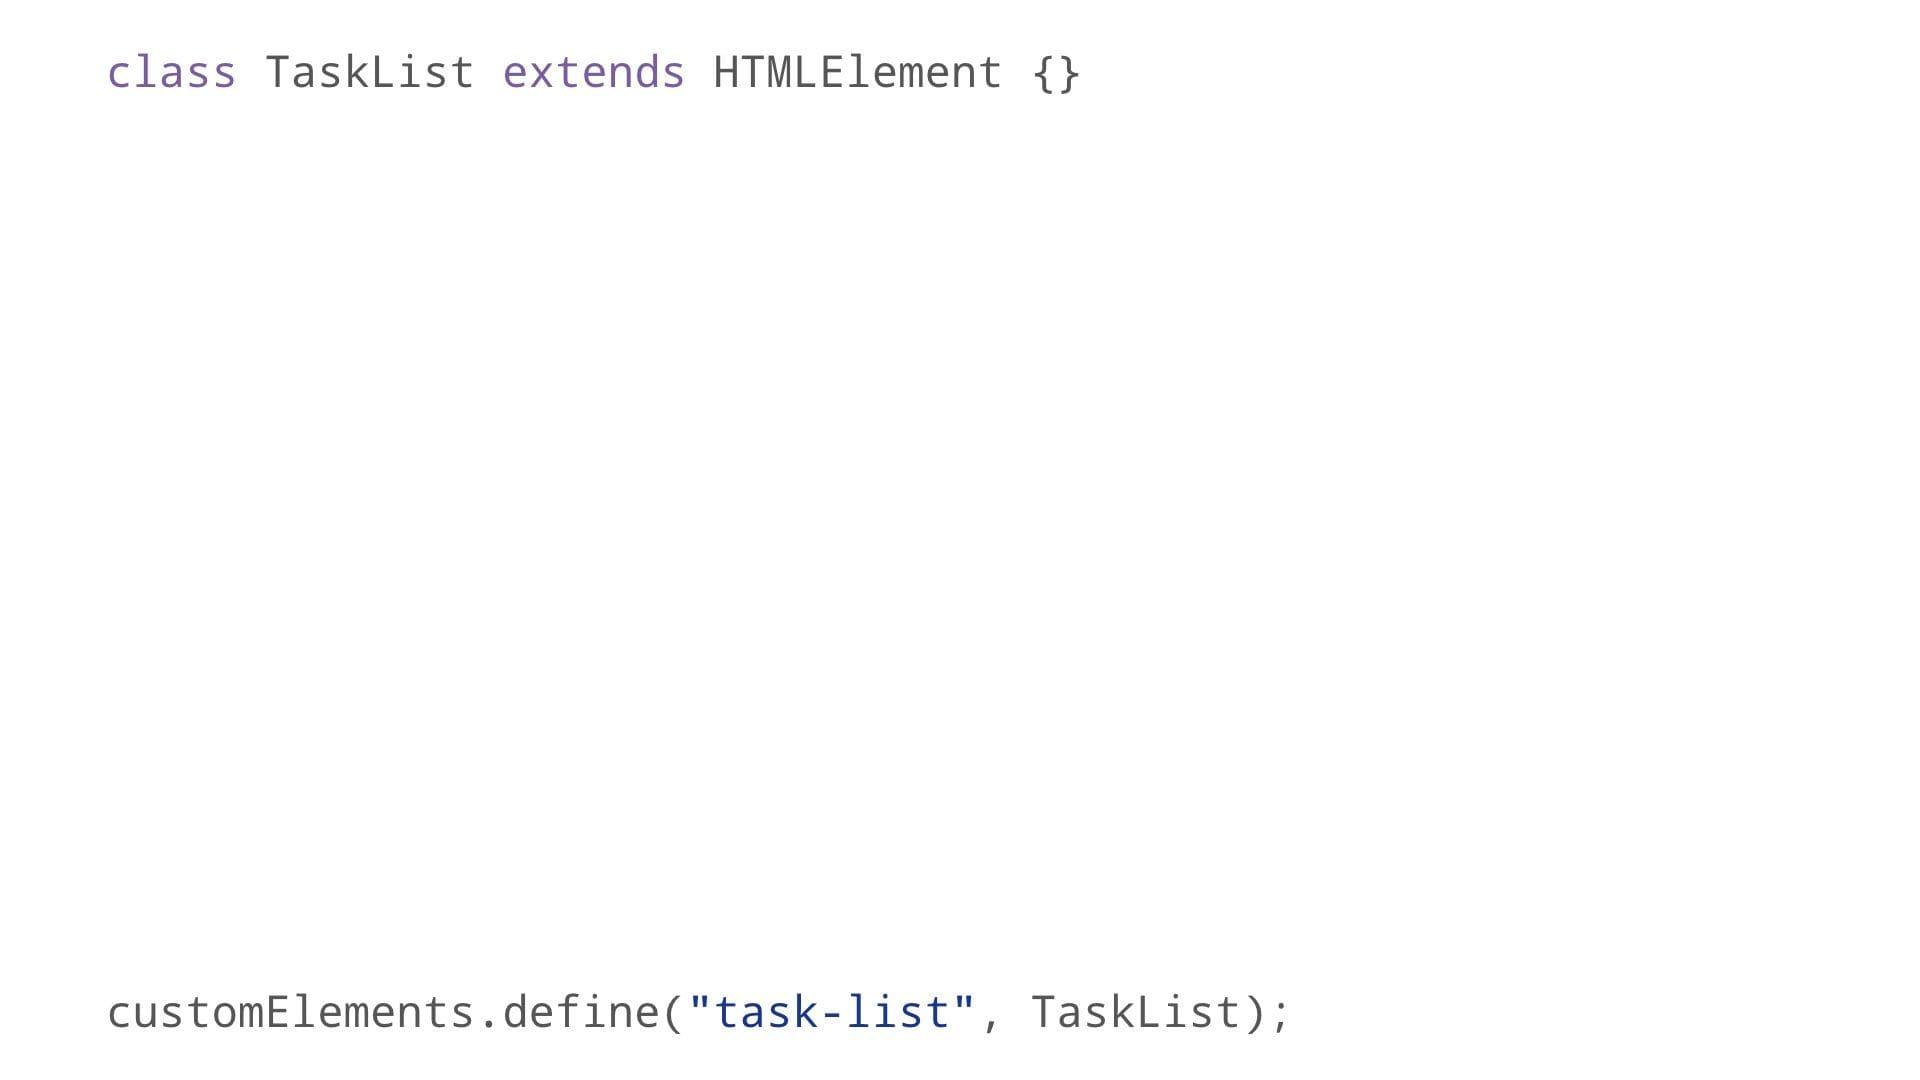 HTMLElement subclass